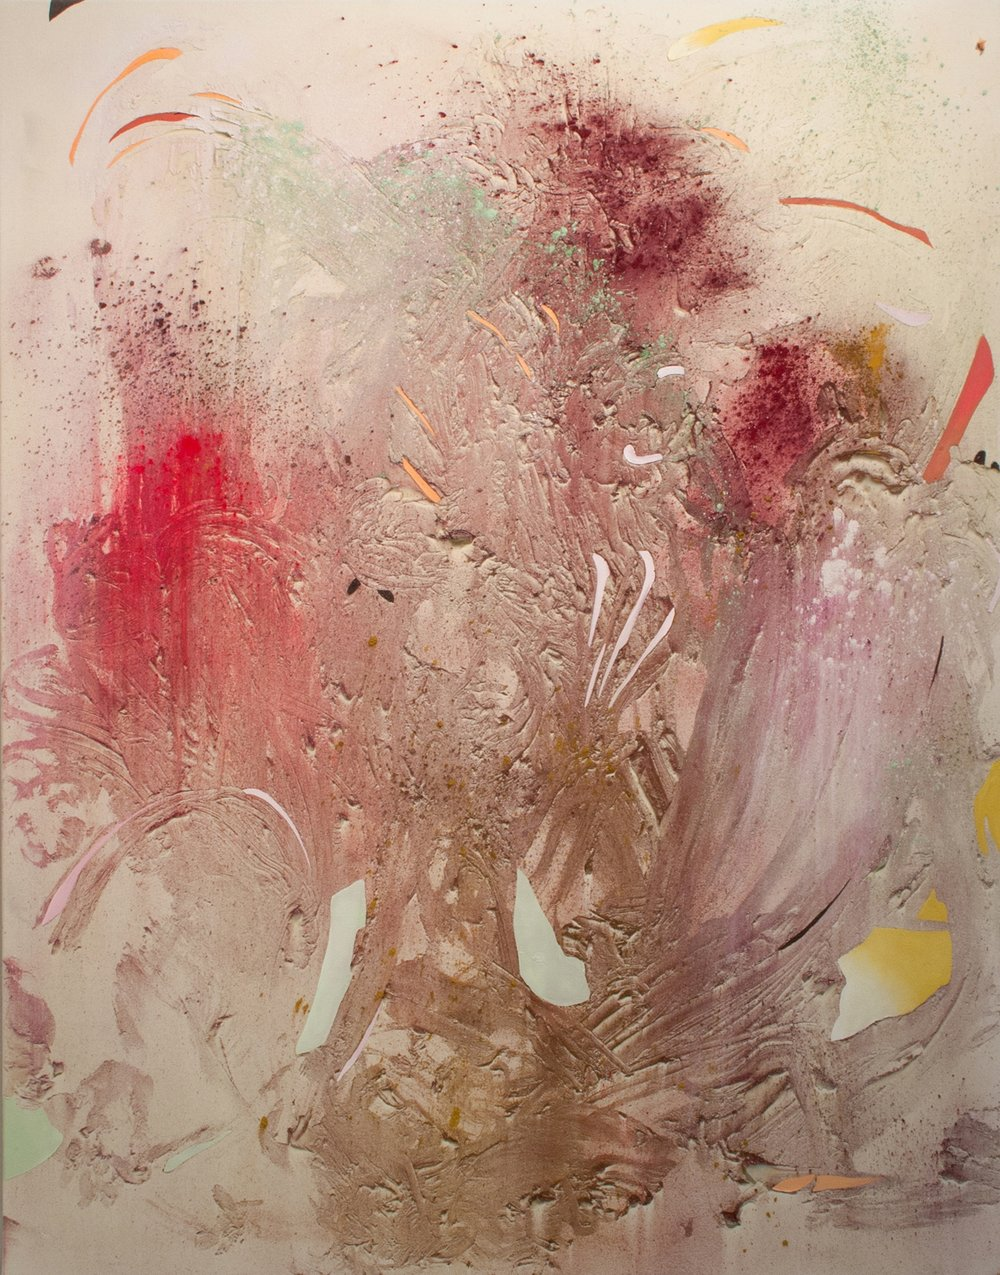 Megacaldera 1, Cold Wax Medium, Raw Pigments, and Oil on Canvas, 5x4 feet, 2016